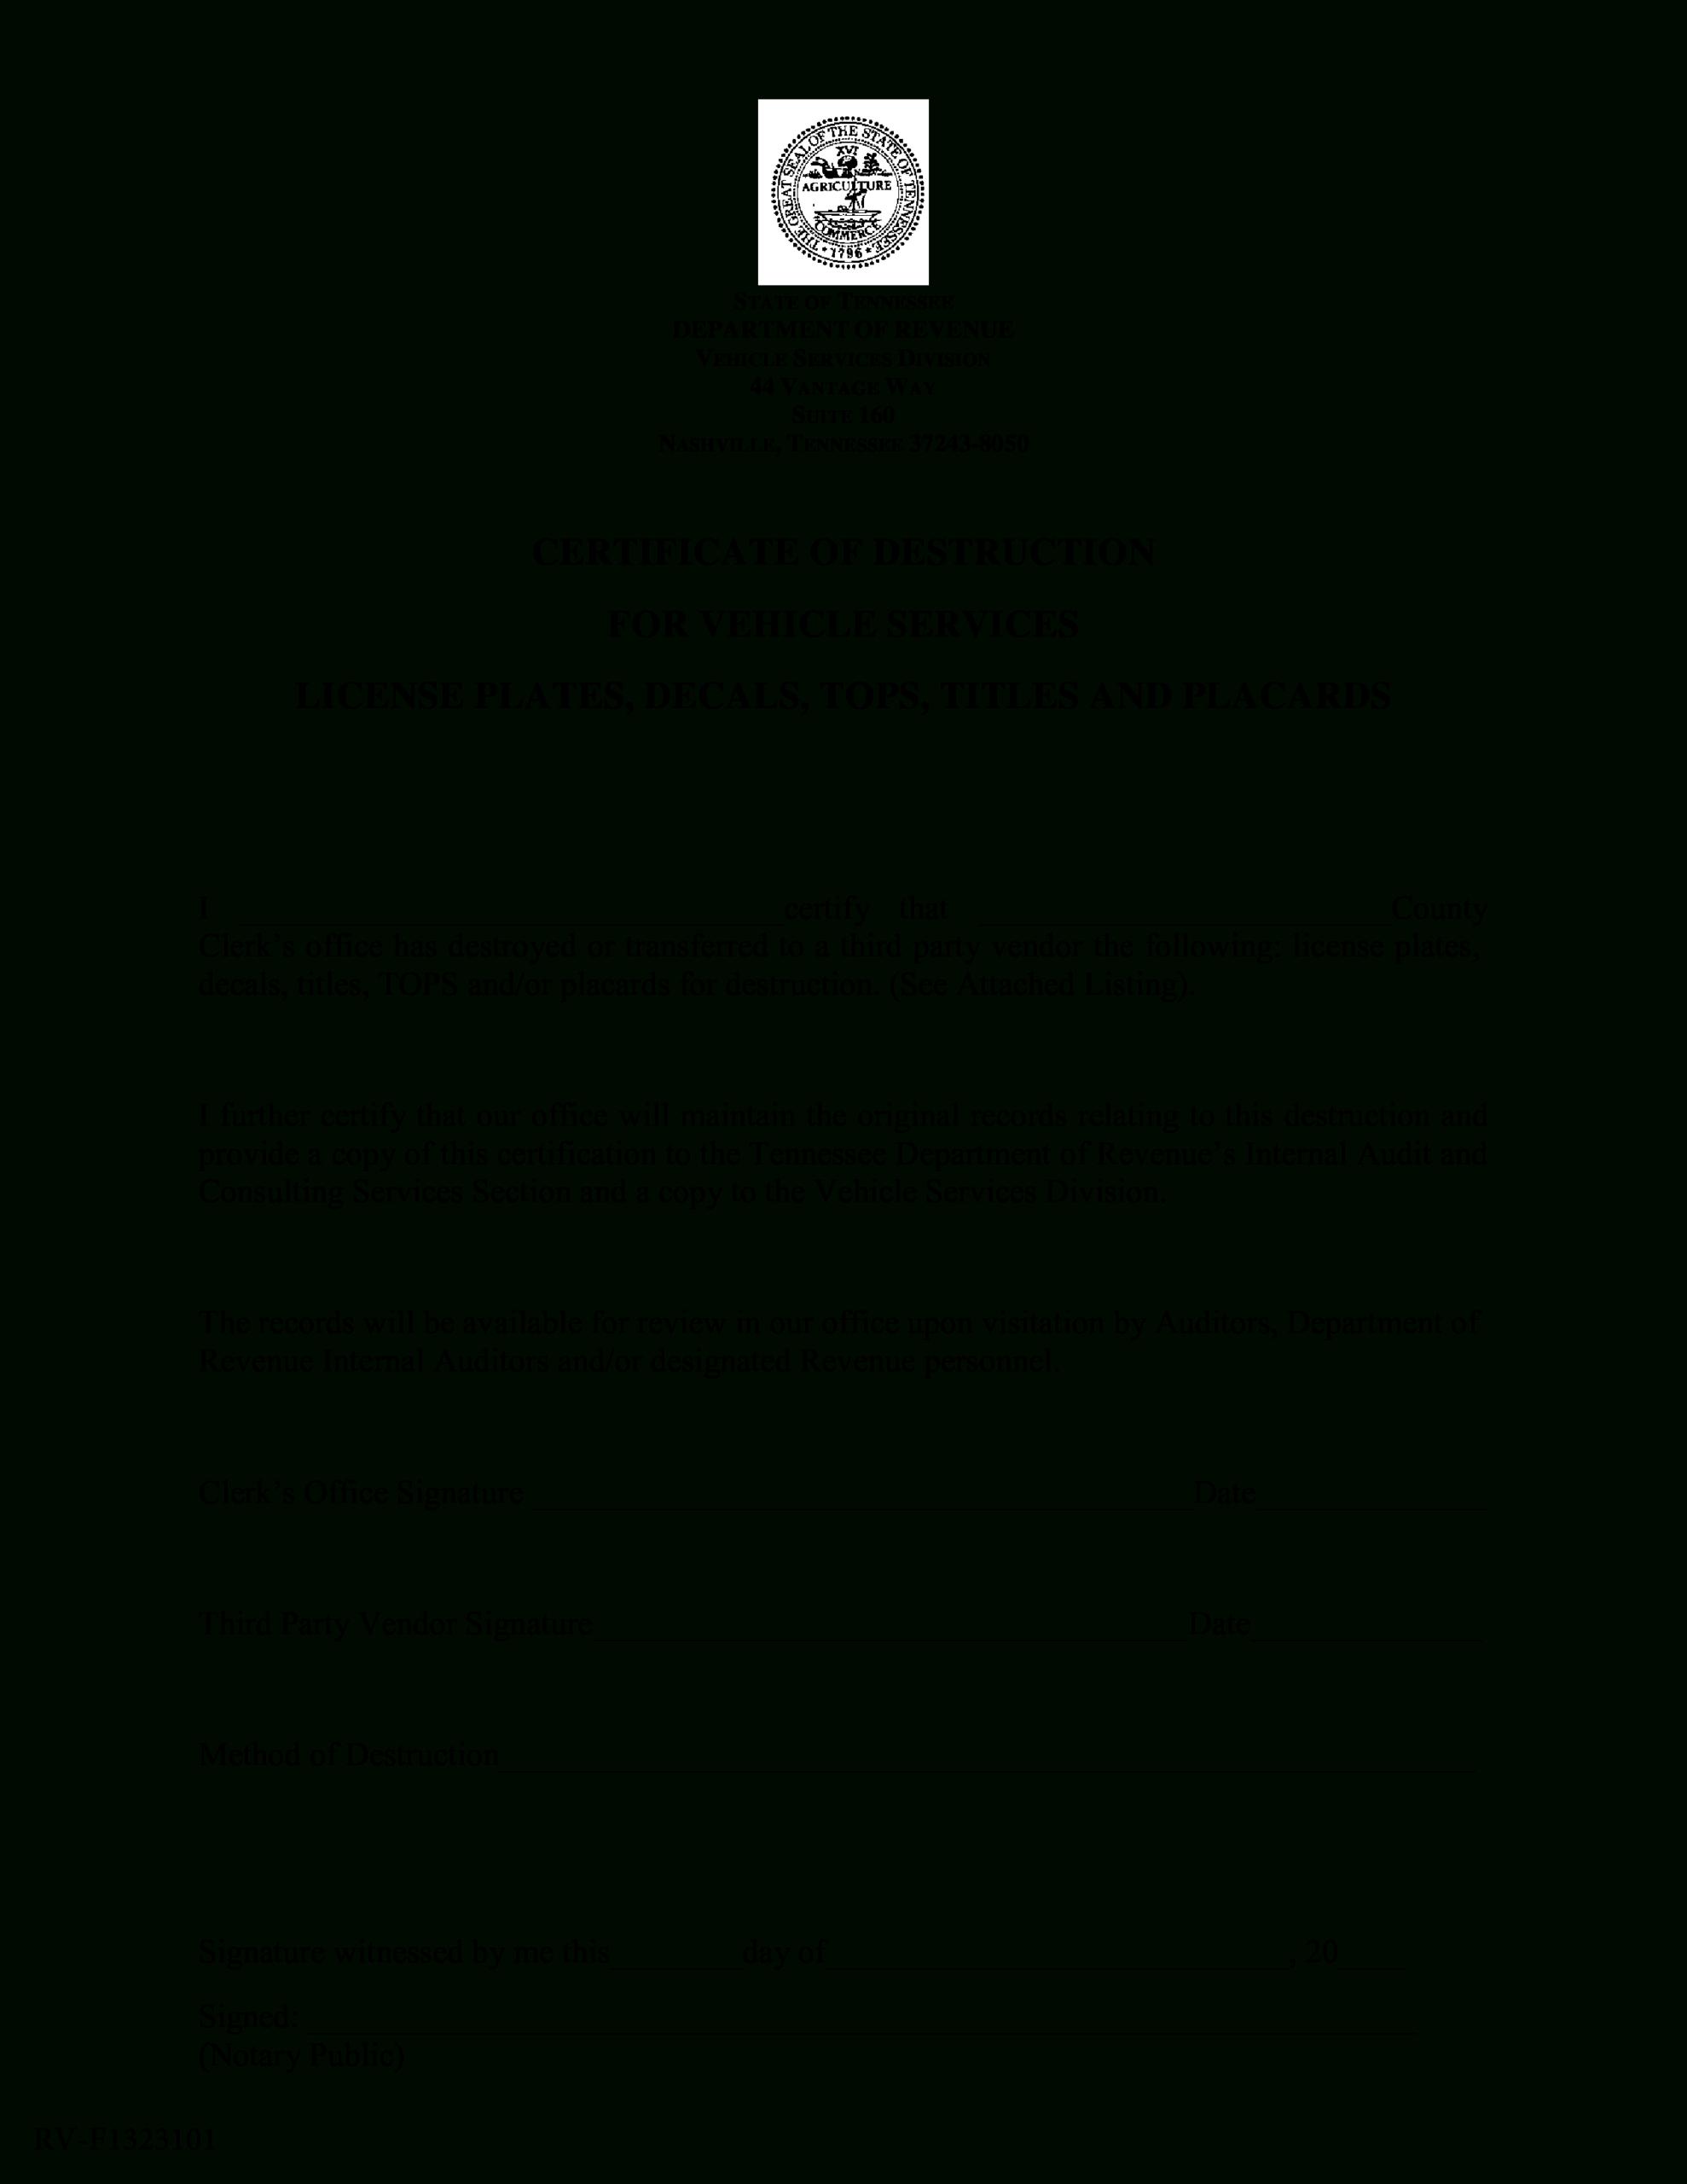 Vehicle Certificate Of Destruction   Templates At With Regard To Free Certificate Of Destruction Template